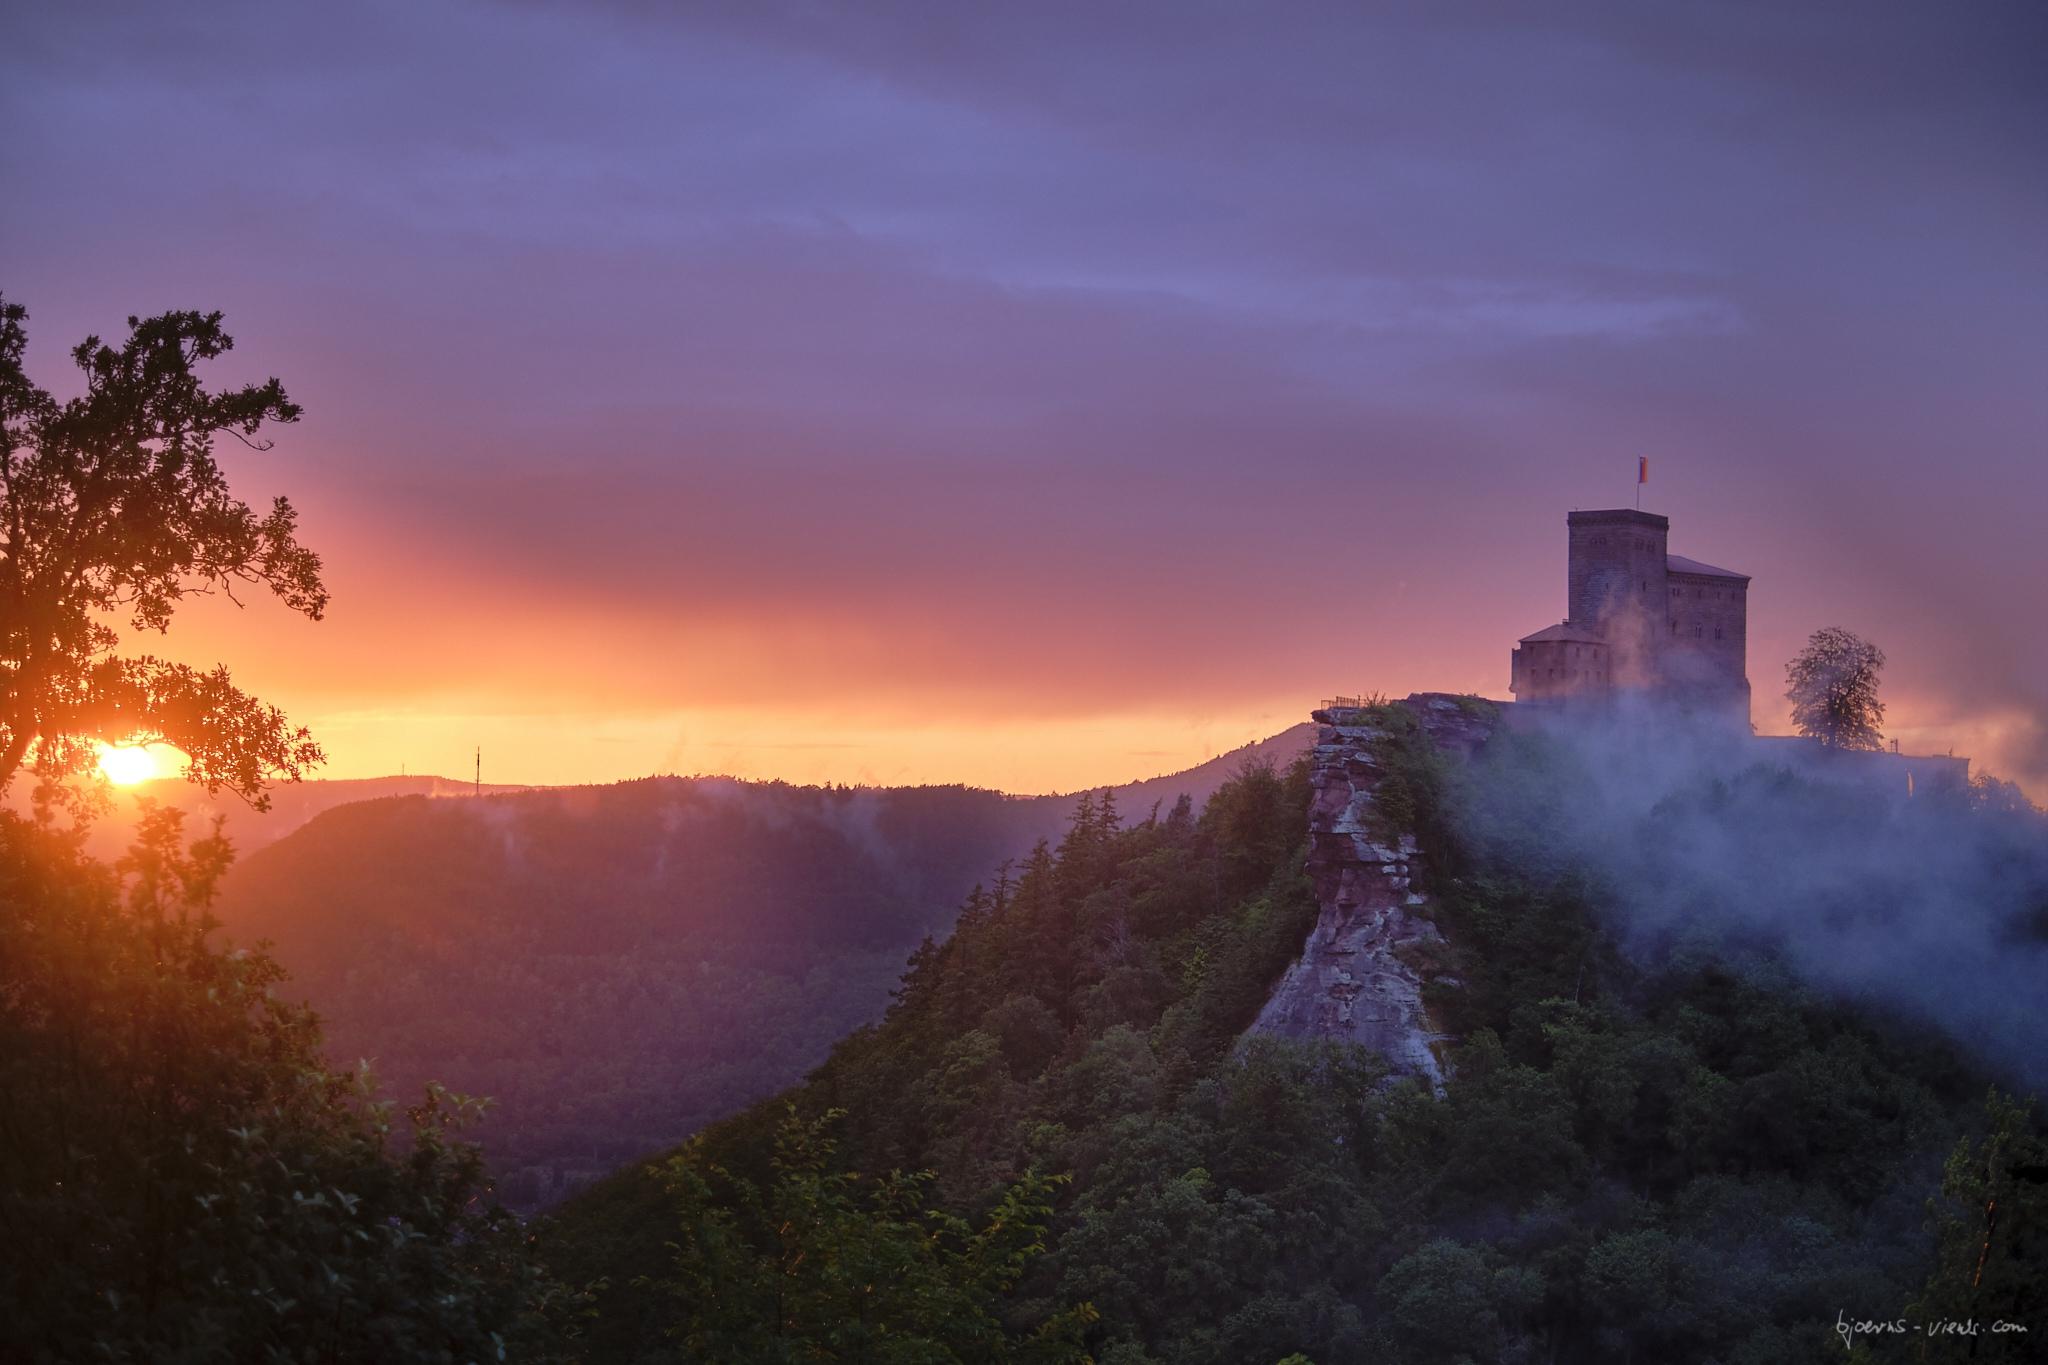 Sonnenuntergang, Pfalz, Anebos, Trifels, Annweiler, Sunset, Nebel, Fog, Sun, Sonne, Burg, Castle, Pfälerzwald